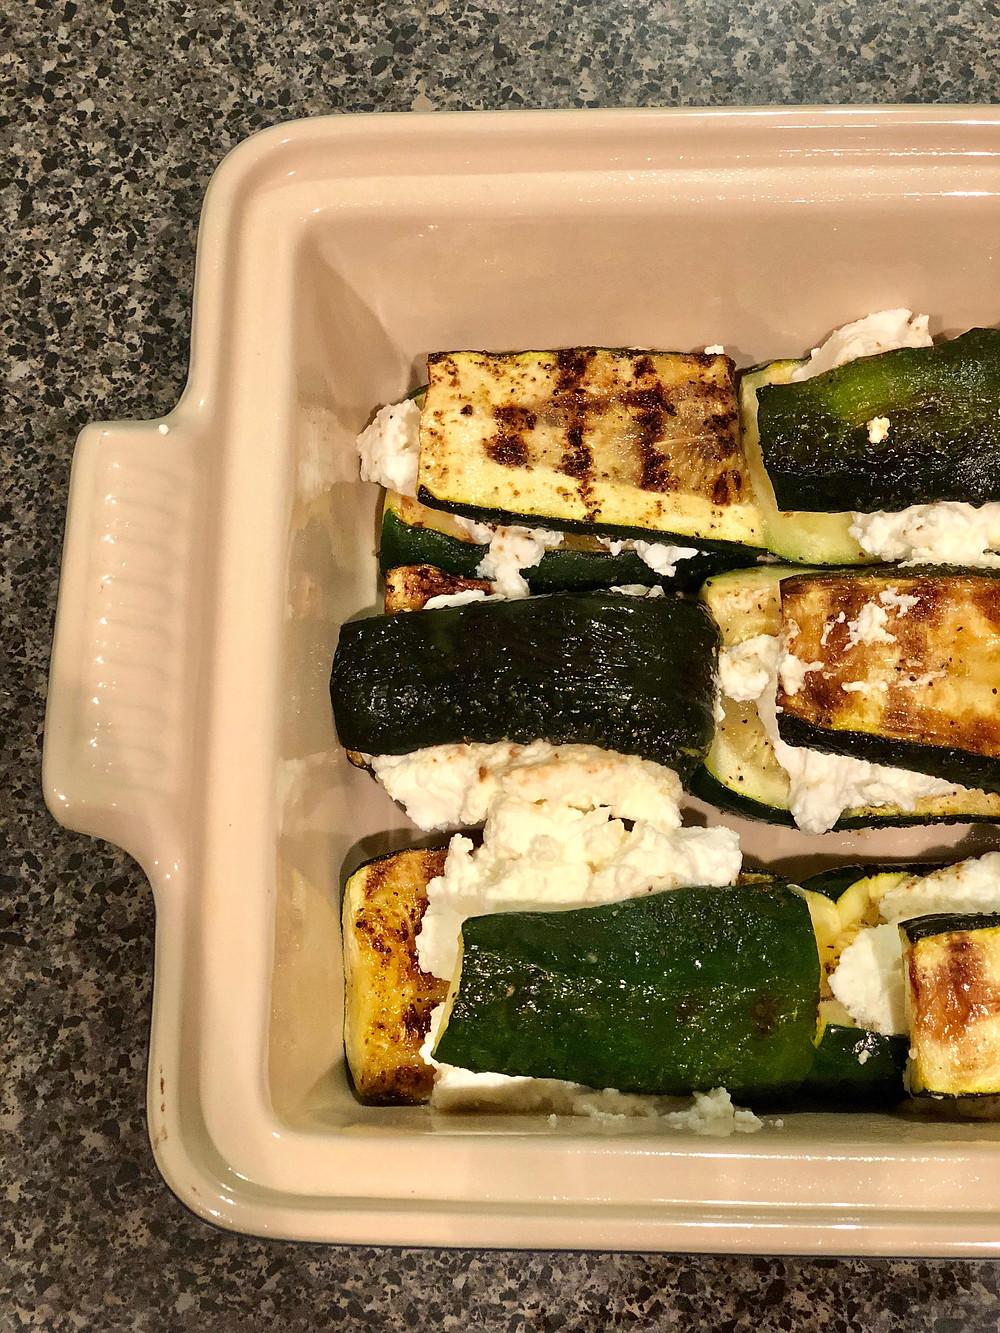 zucchini rollatini prepped